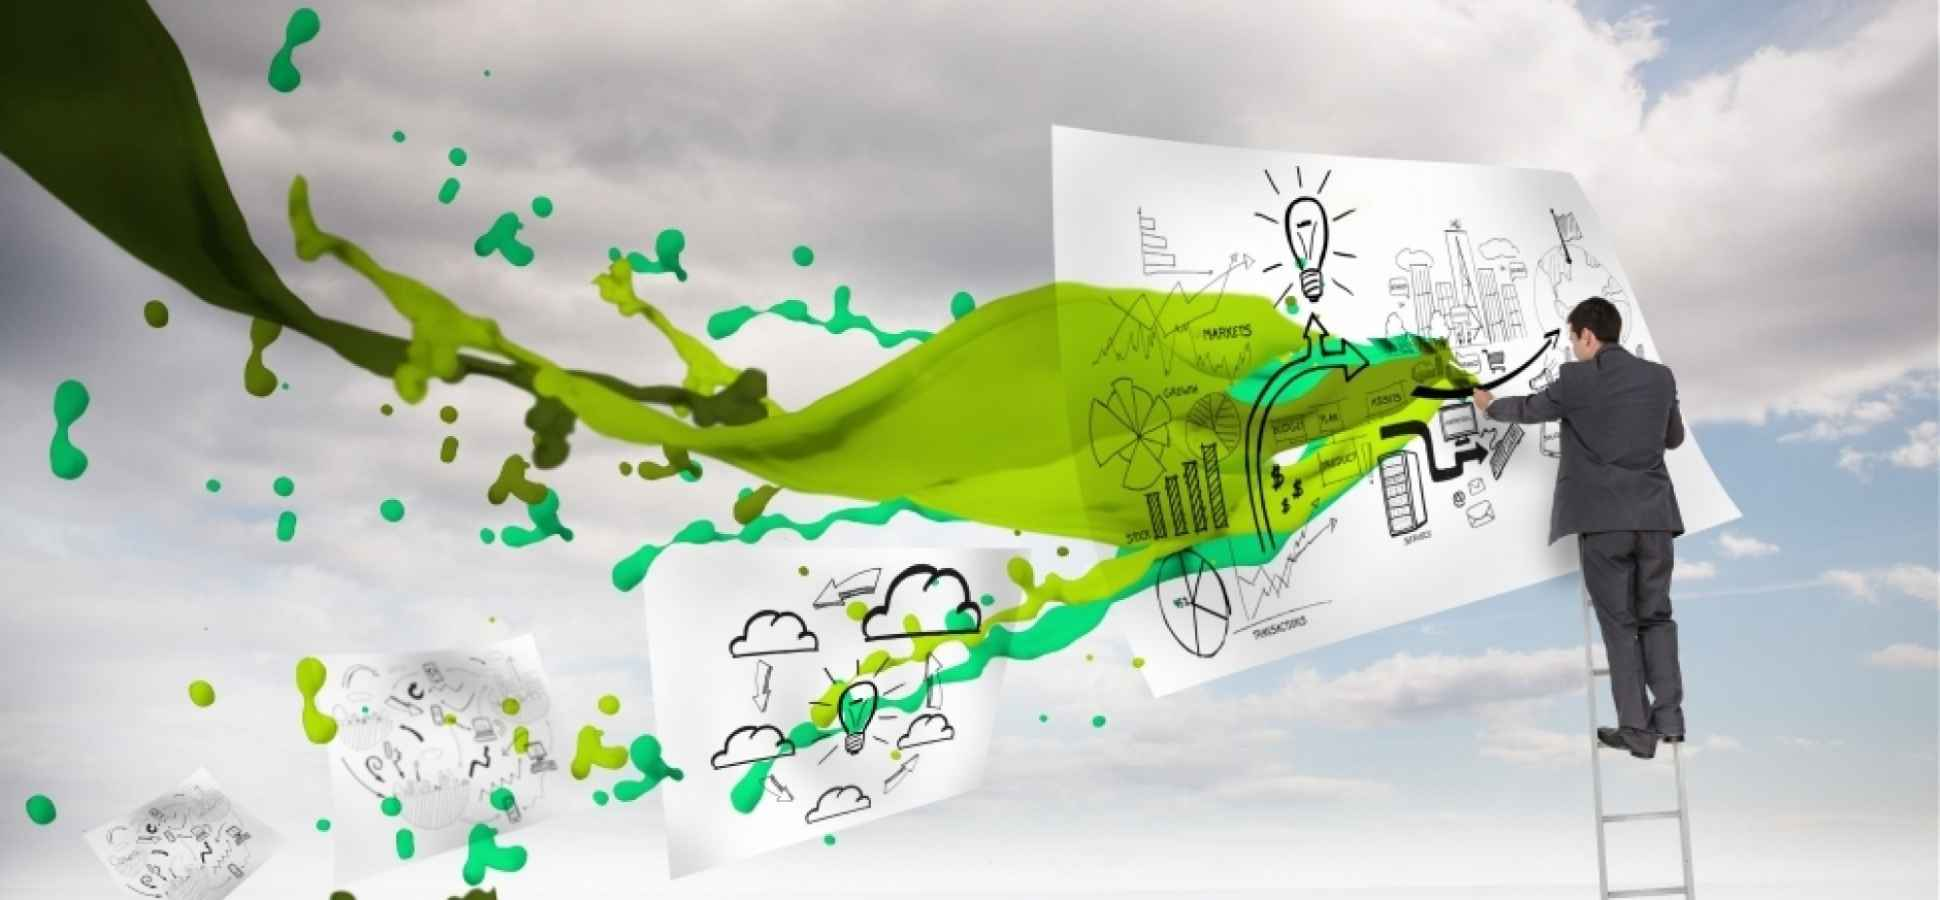 7 Ways to Kick-Start Corporate Innovation